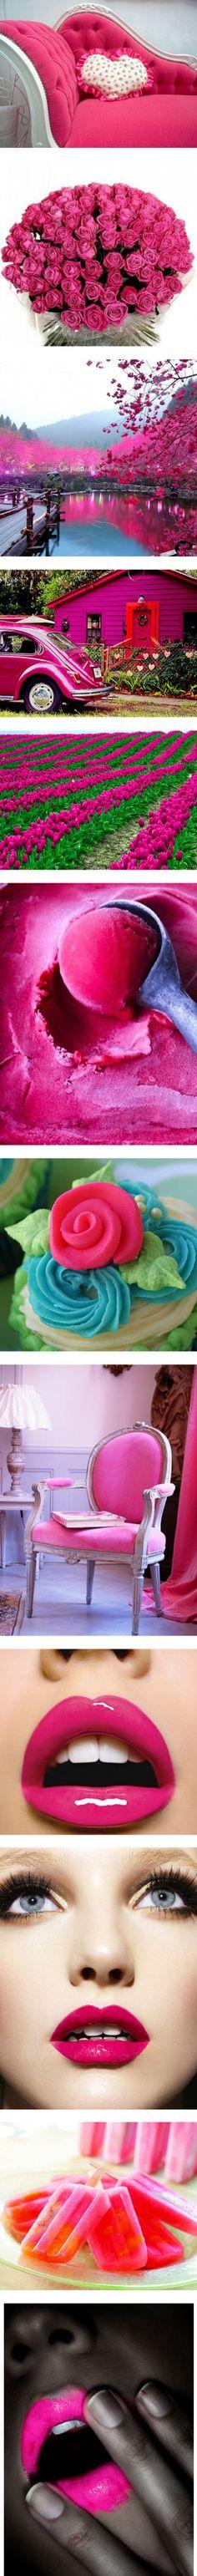 """image fushia /rose"" by jess-leonie ❤ liked on Polyvore"